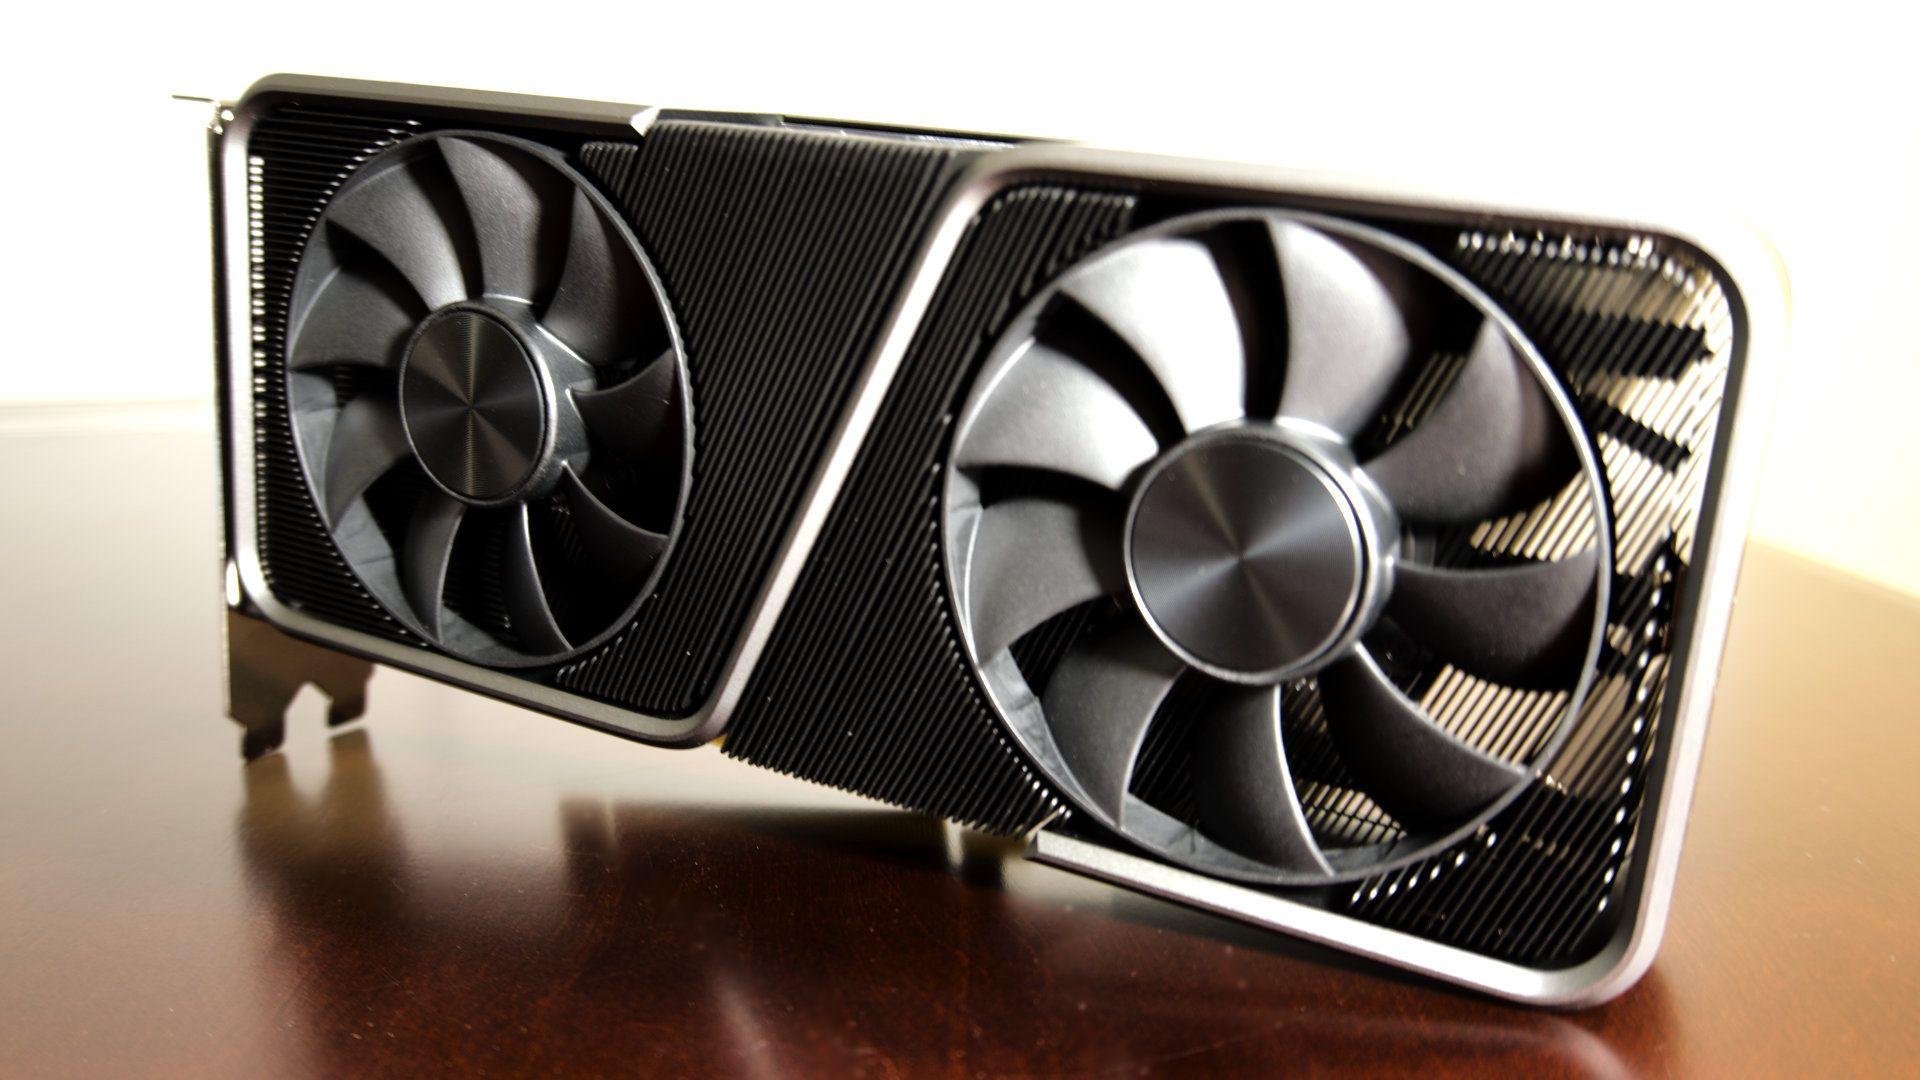 Dual fans, same side